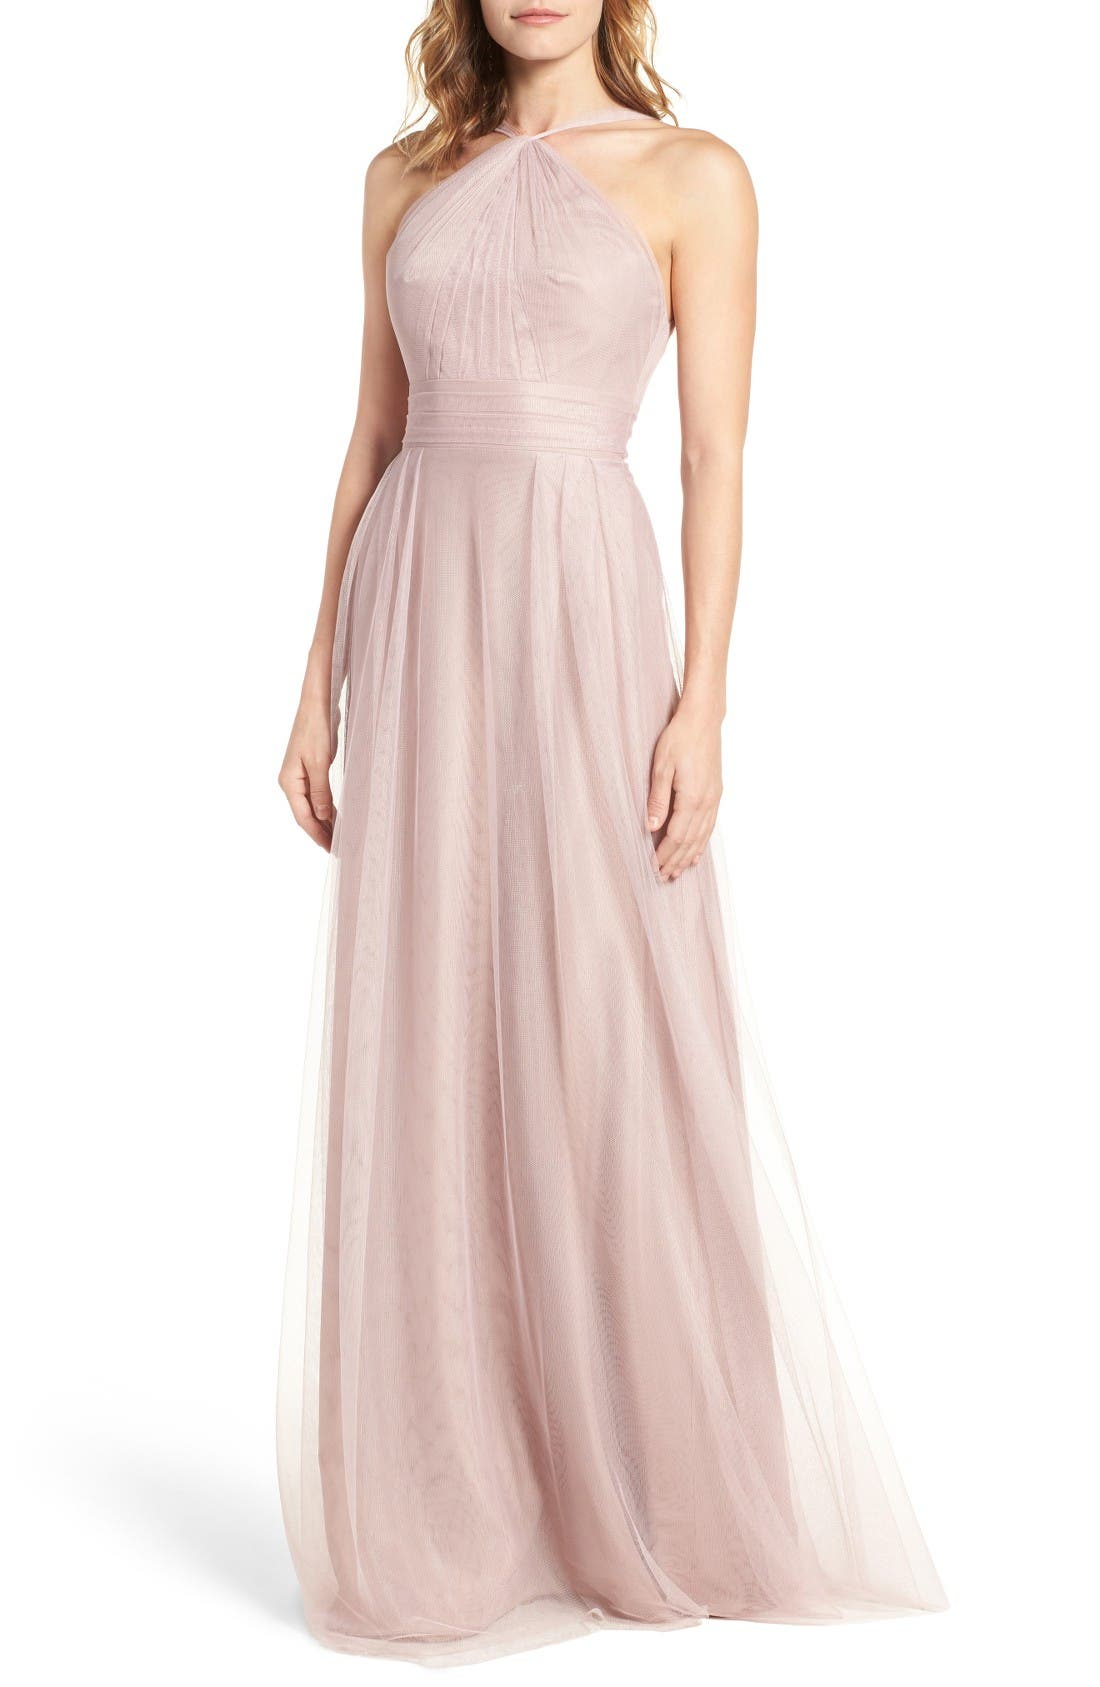 Main Image - Monique Lhuillier Bridesmaids Tulle Halter Style Gown